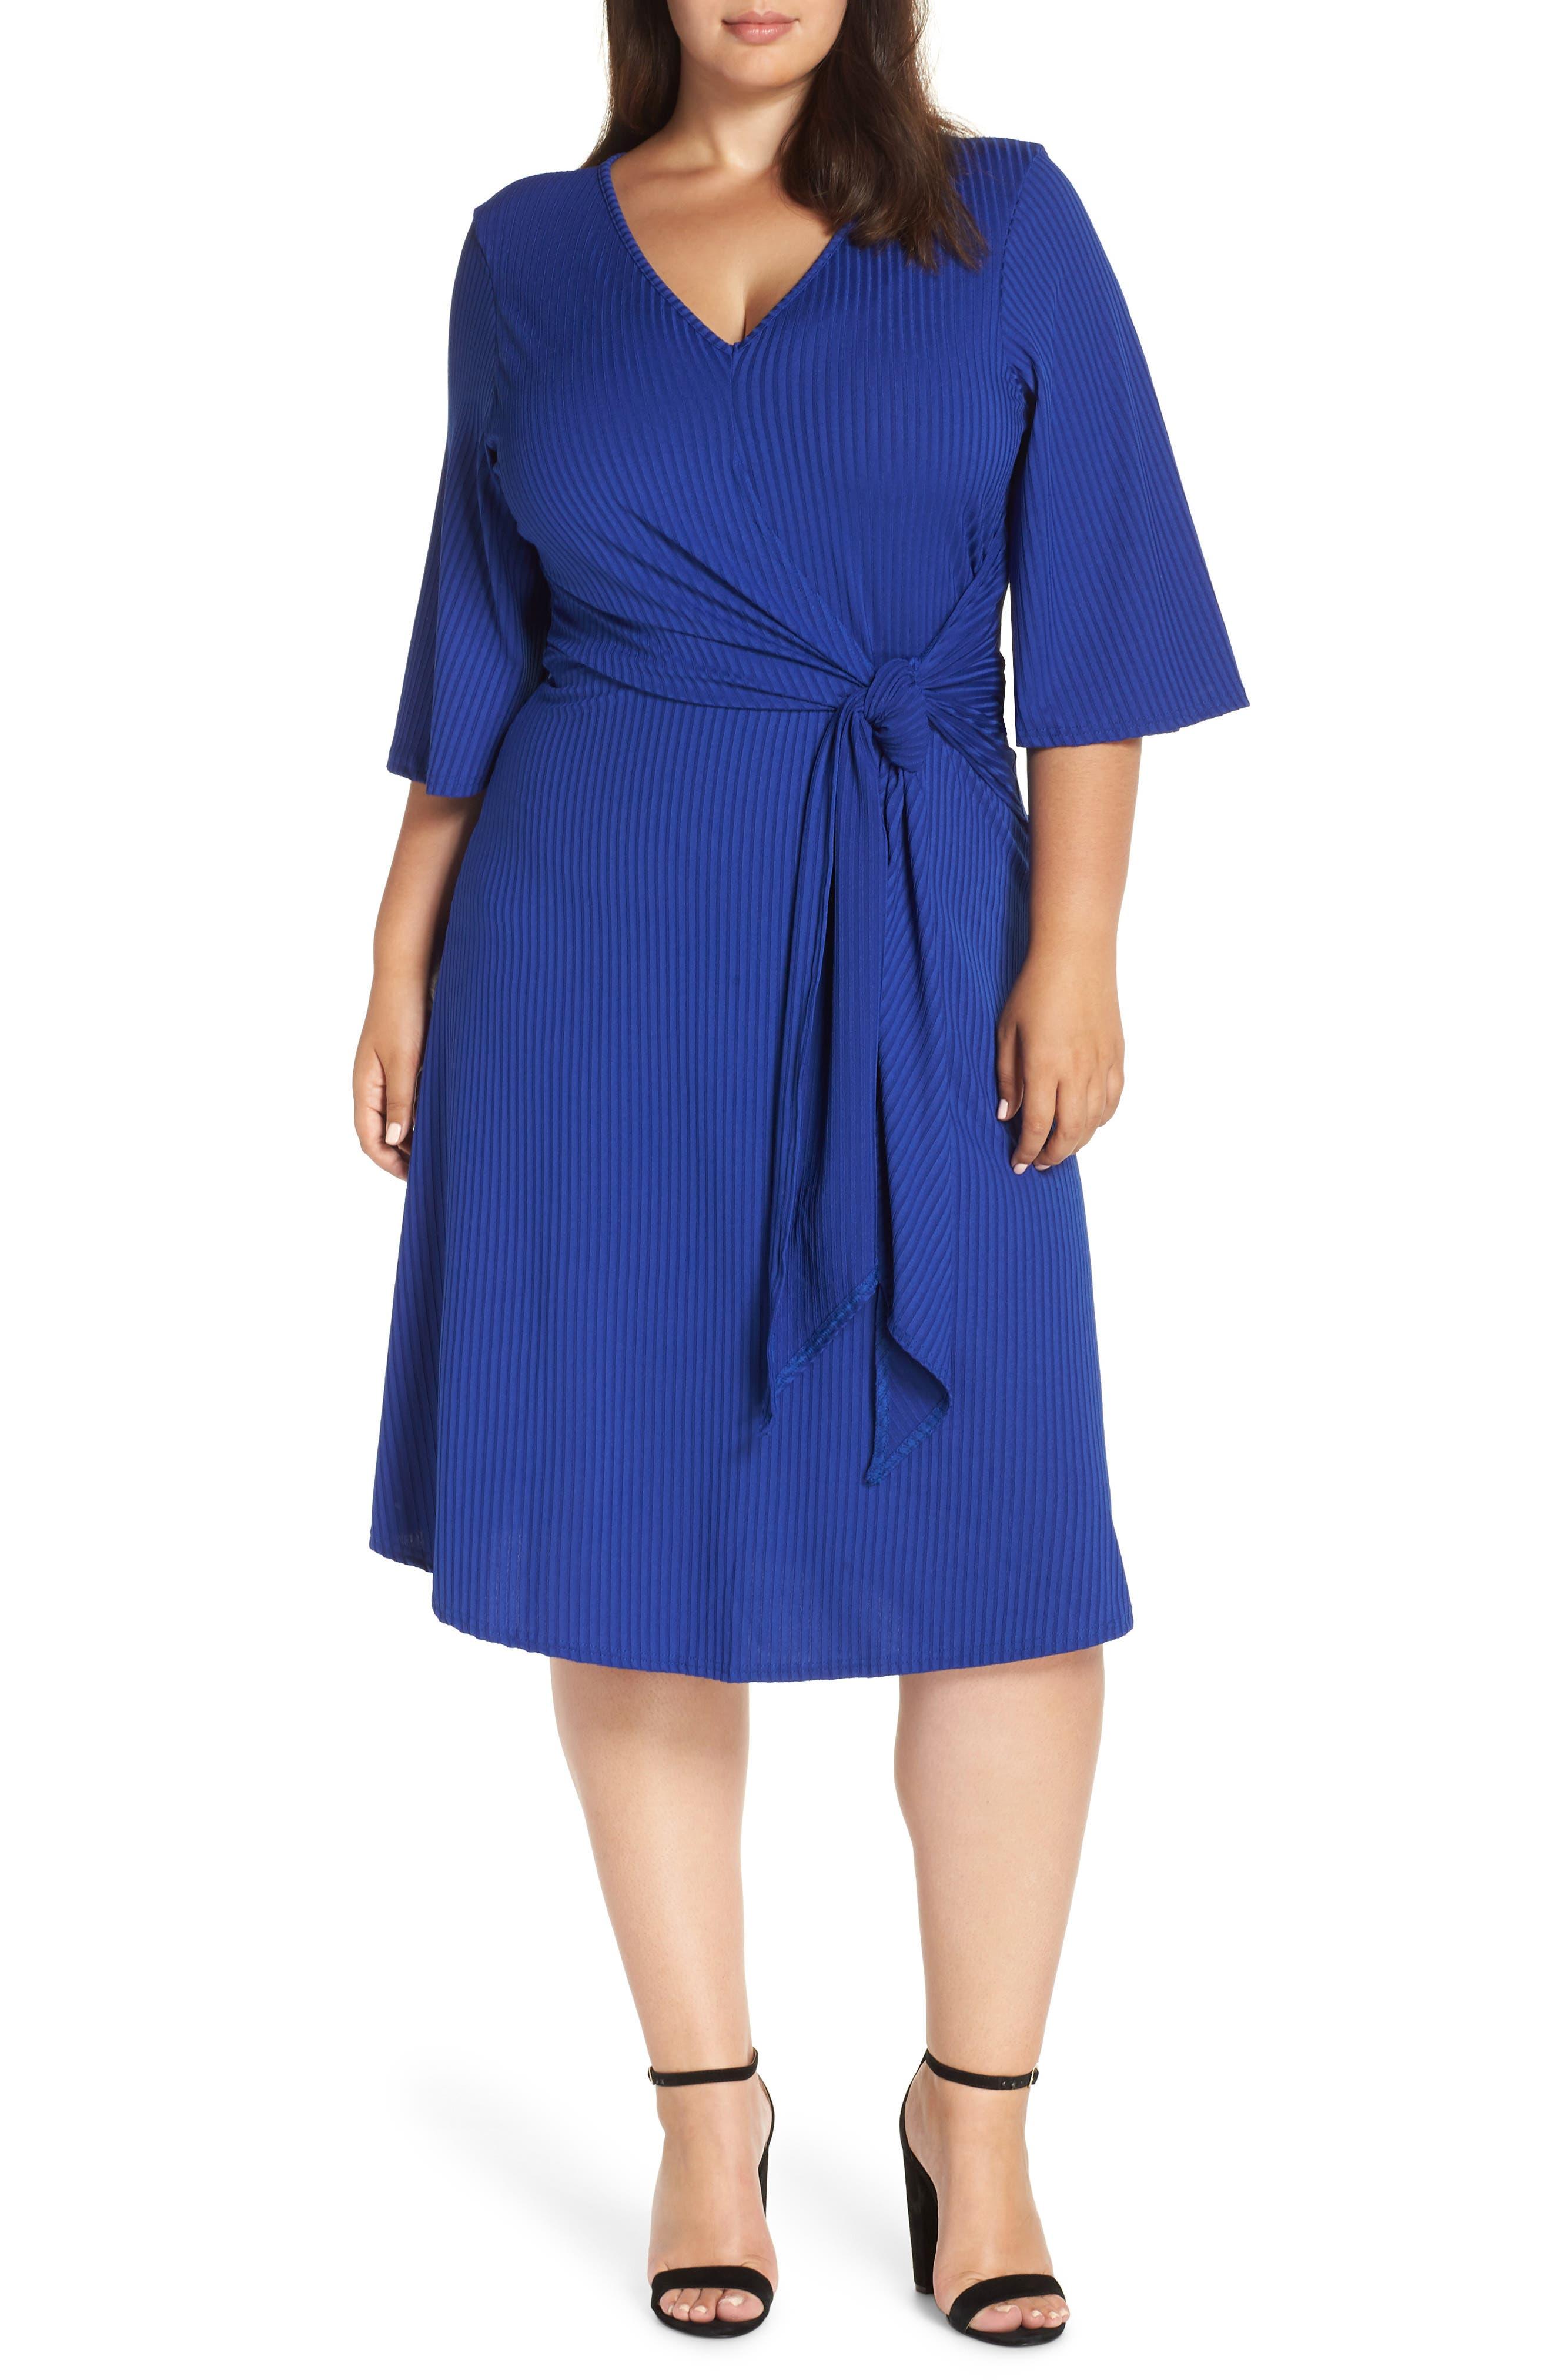 Ribbed Knit Skater Dress,                             Main thumbnail 1, color,                             BLUE